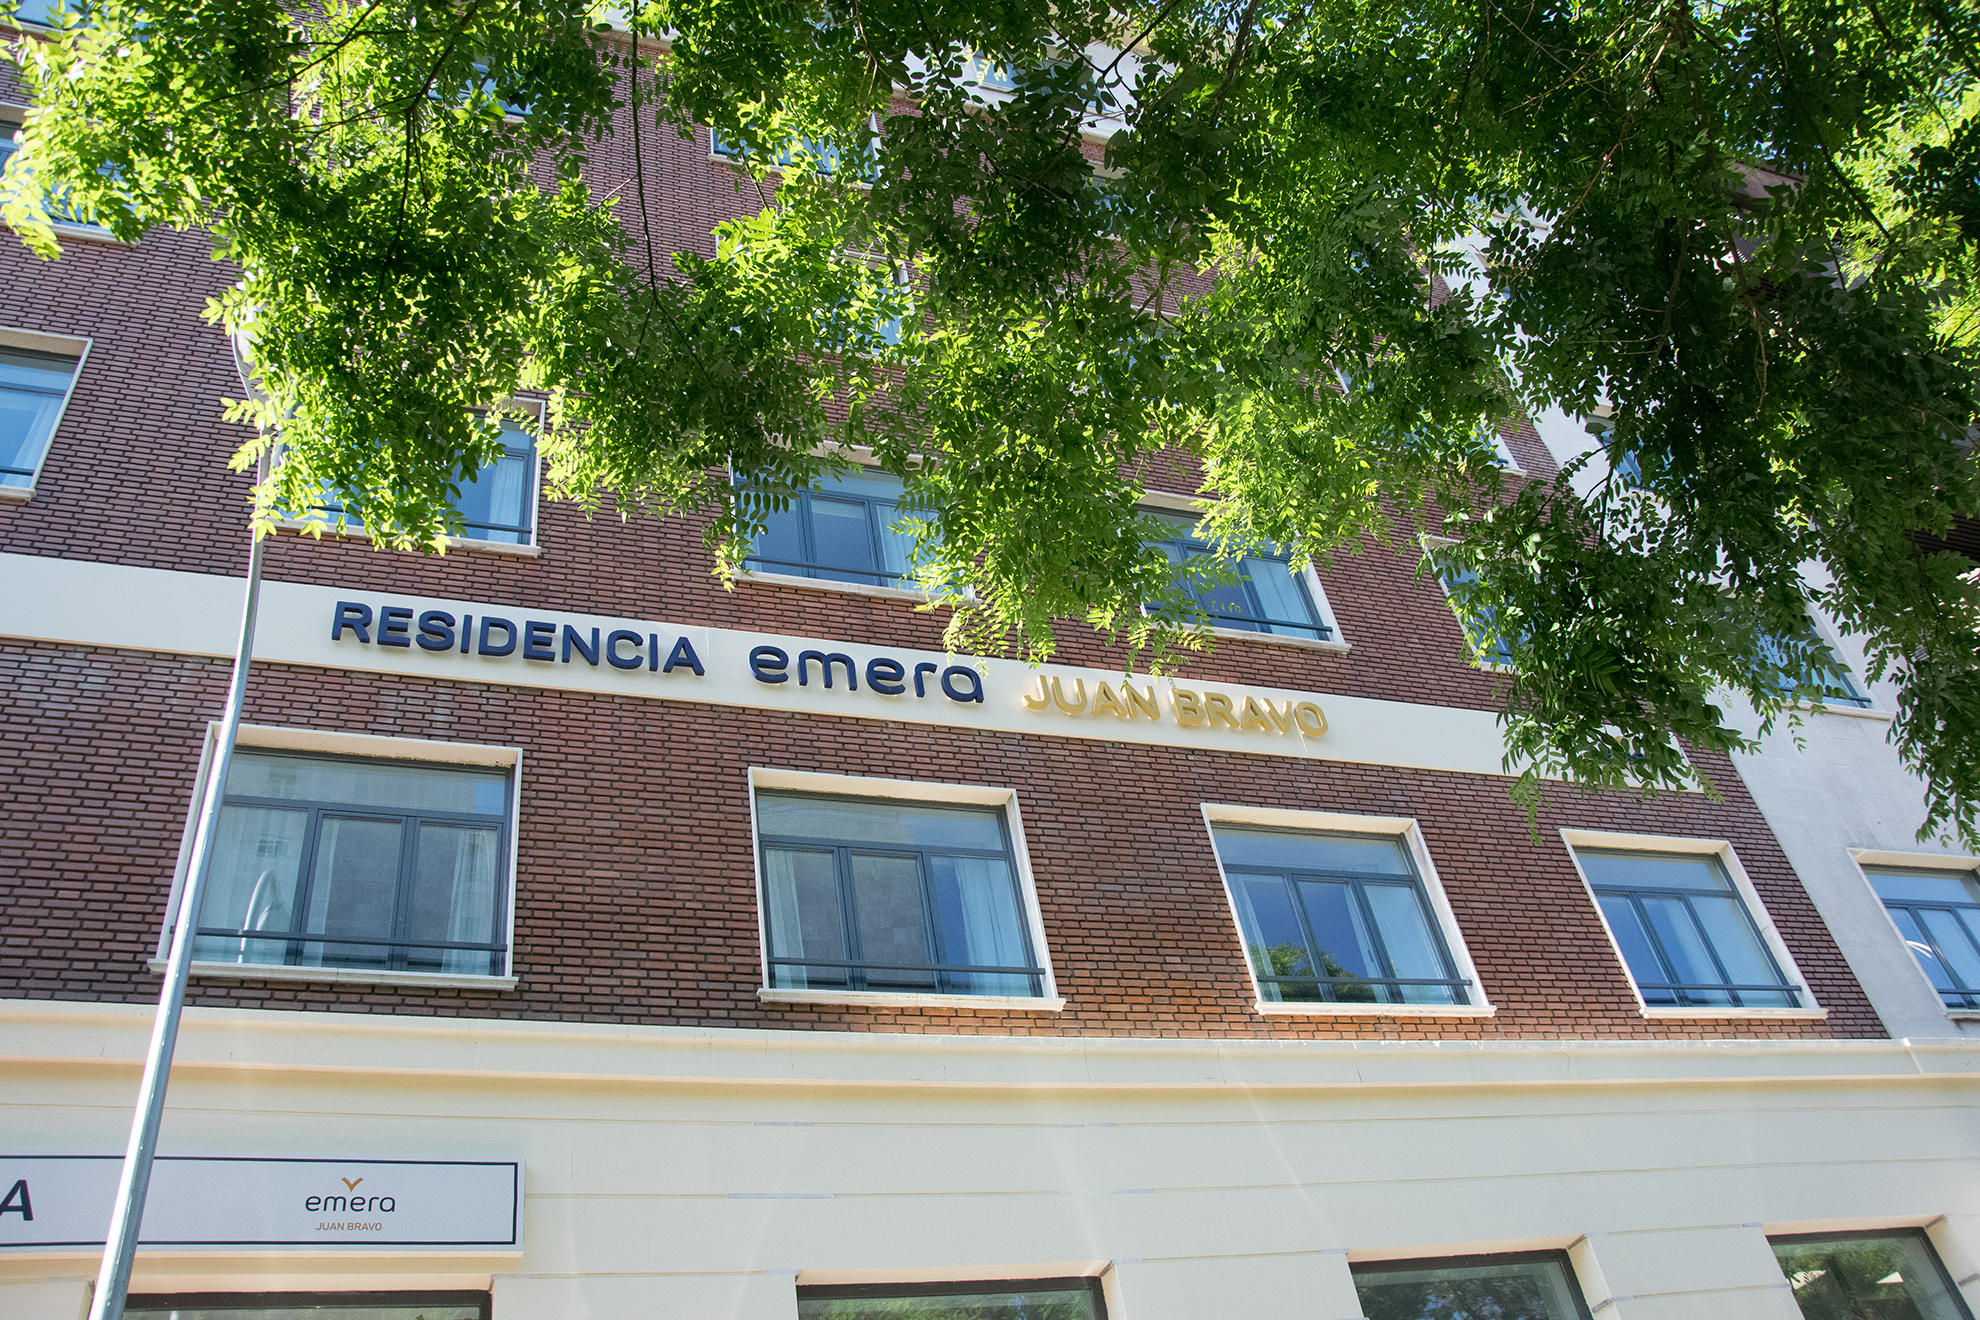 Residencia para mayores Emera Juan Bravo fachada